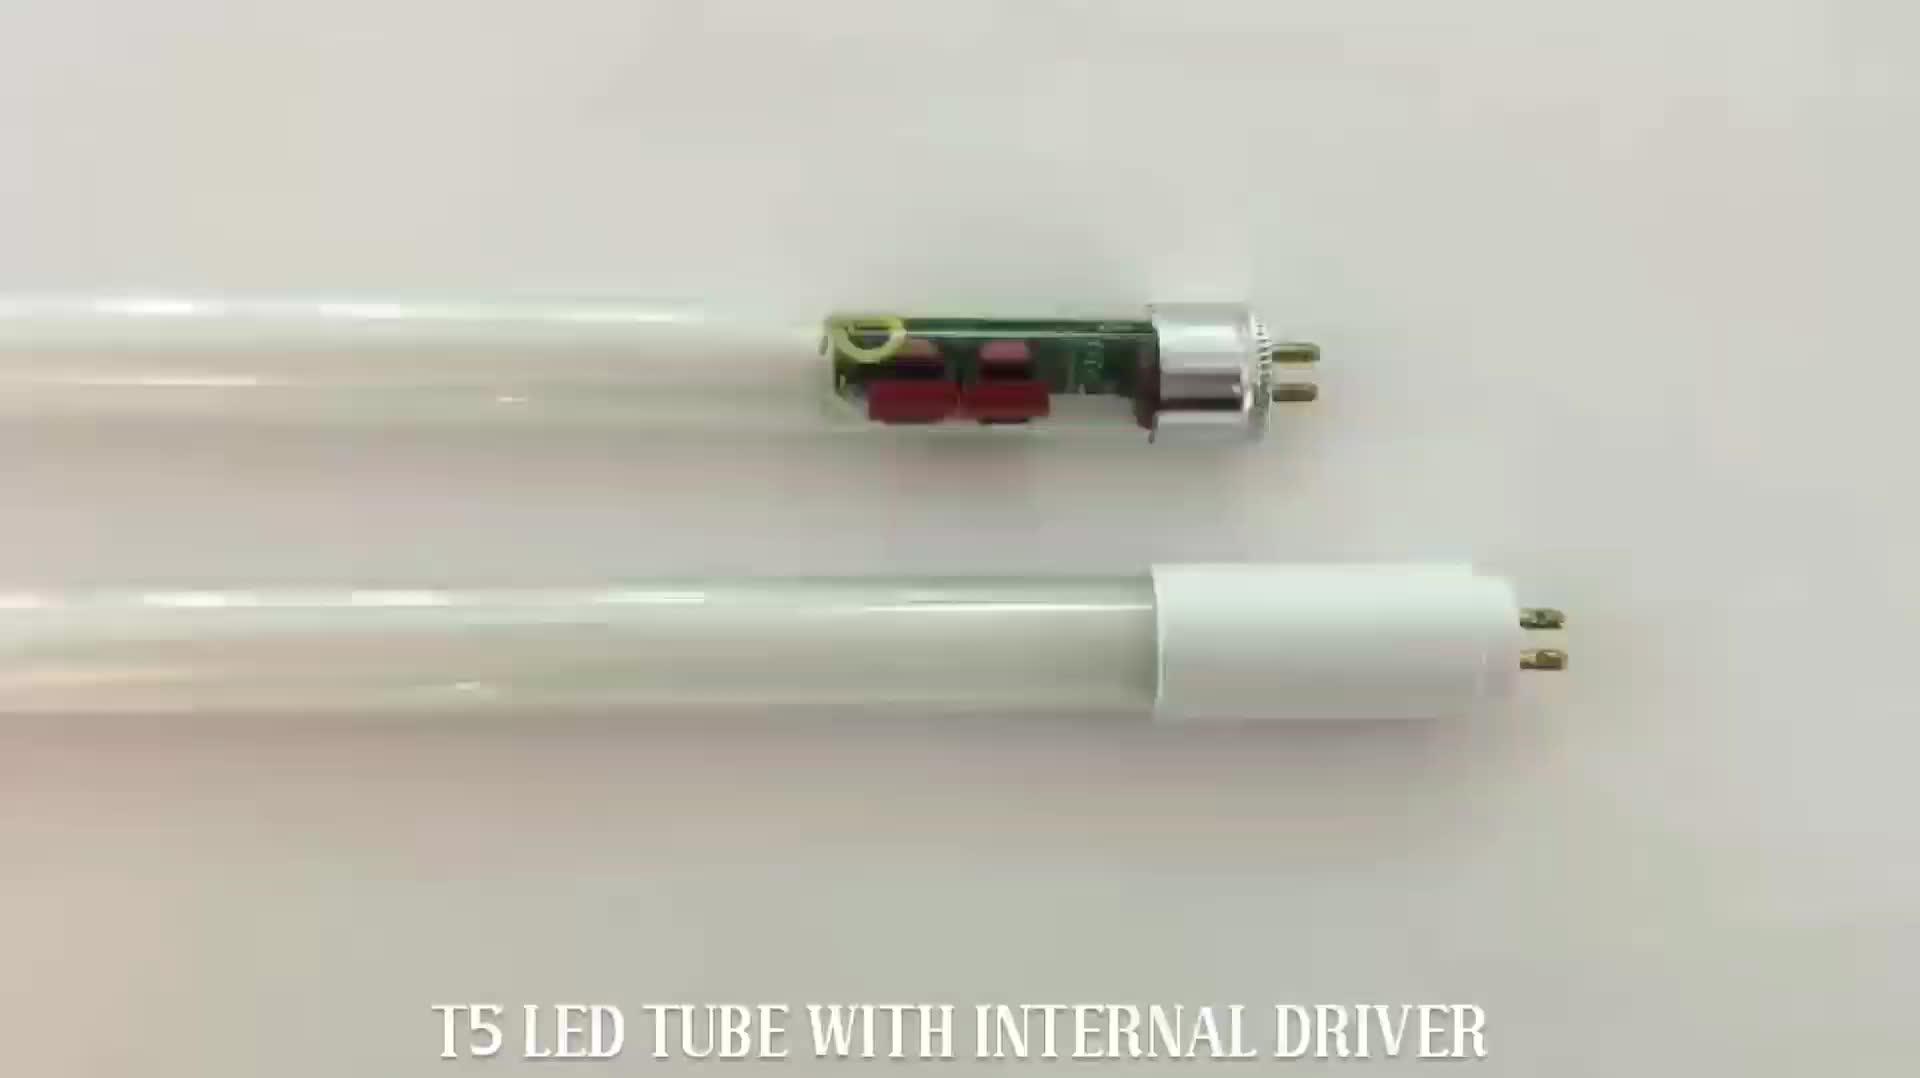 CE ROHS high quality 18w 4feet T5 led tube lamps ,led glass tube light G5 base